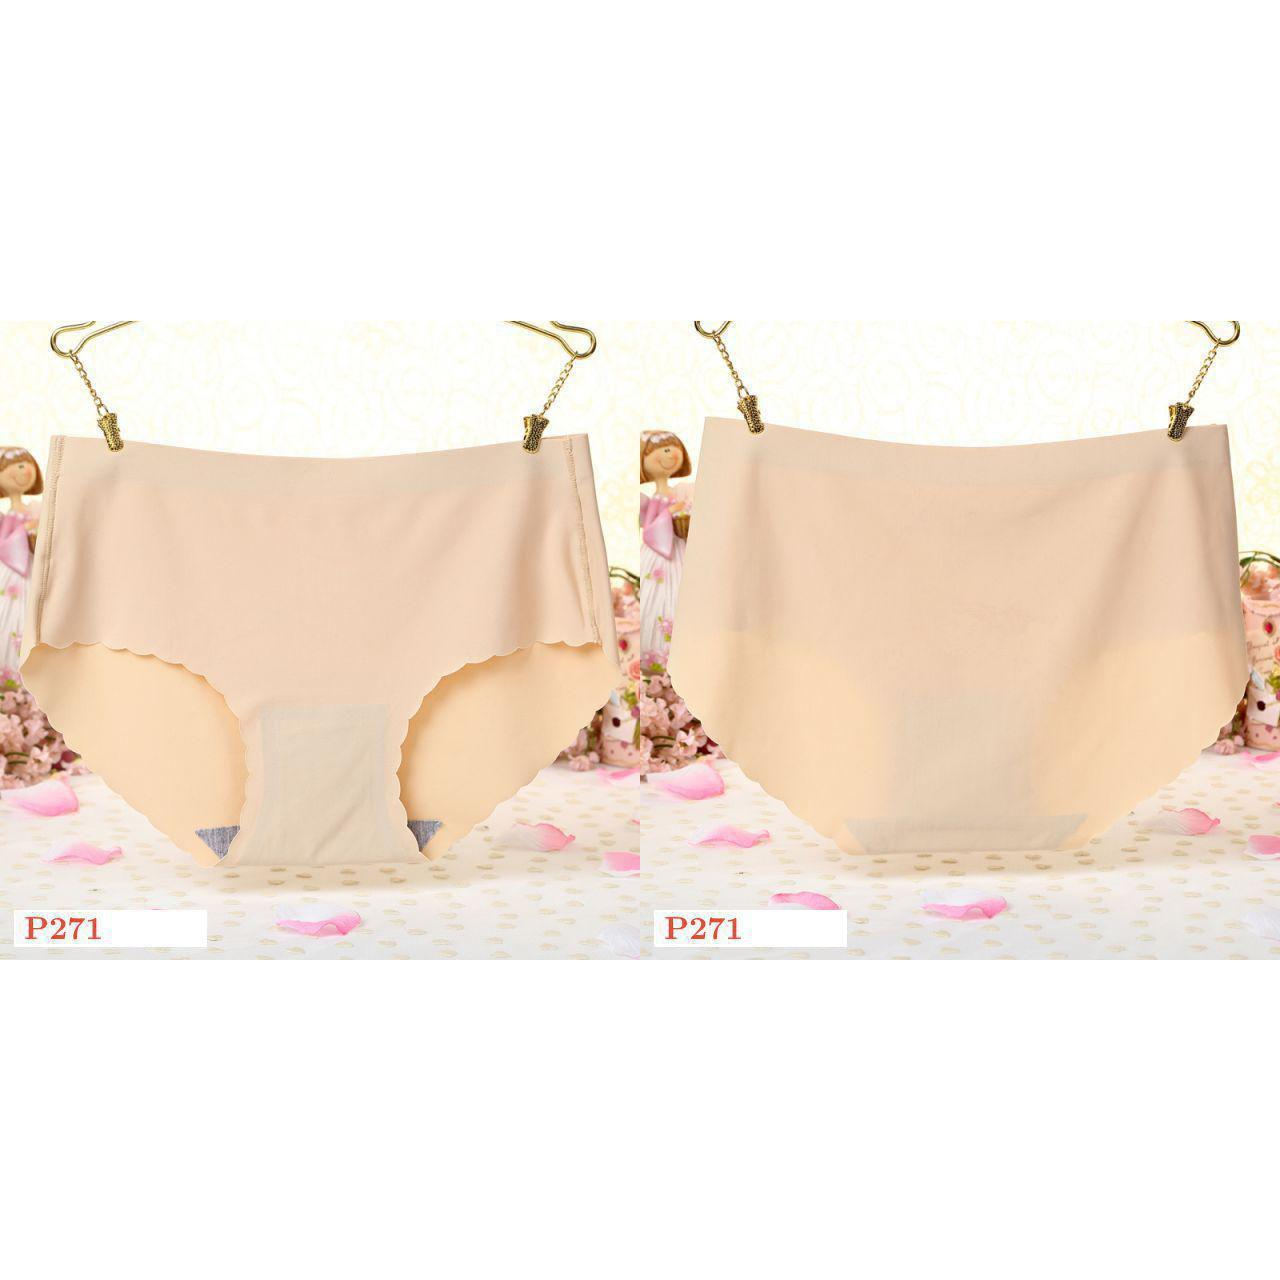 Buy Sell Cheapest P271 Best Quality Product Deals Indonesian Store Celana  Dalam Cd Wanita Mini Sorex 4550ca776f